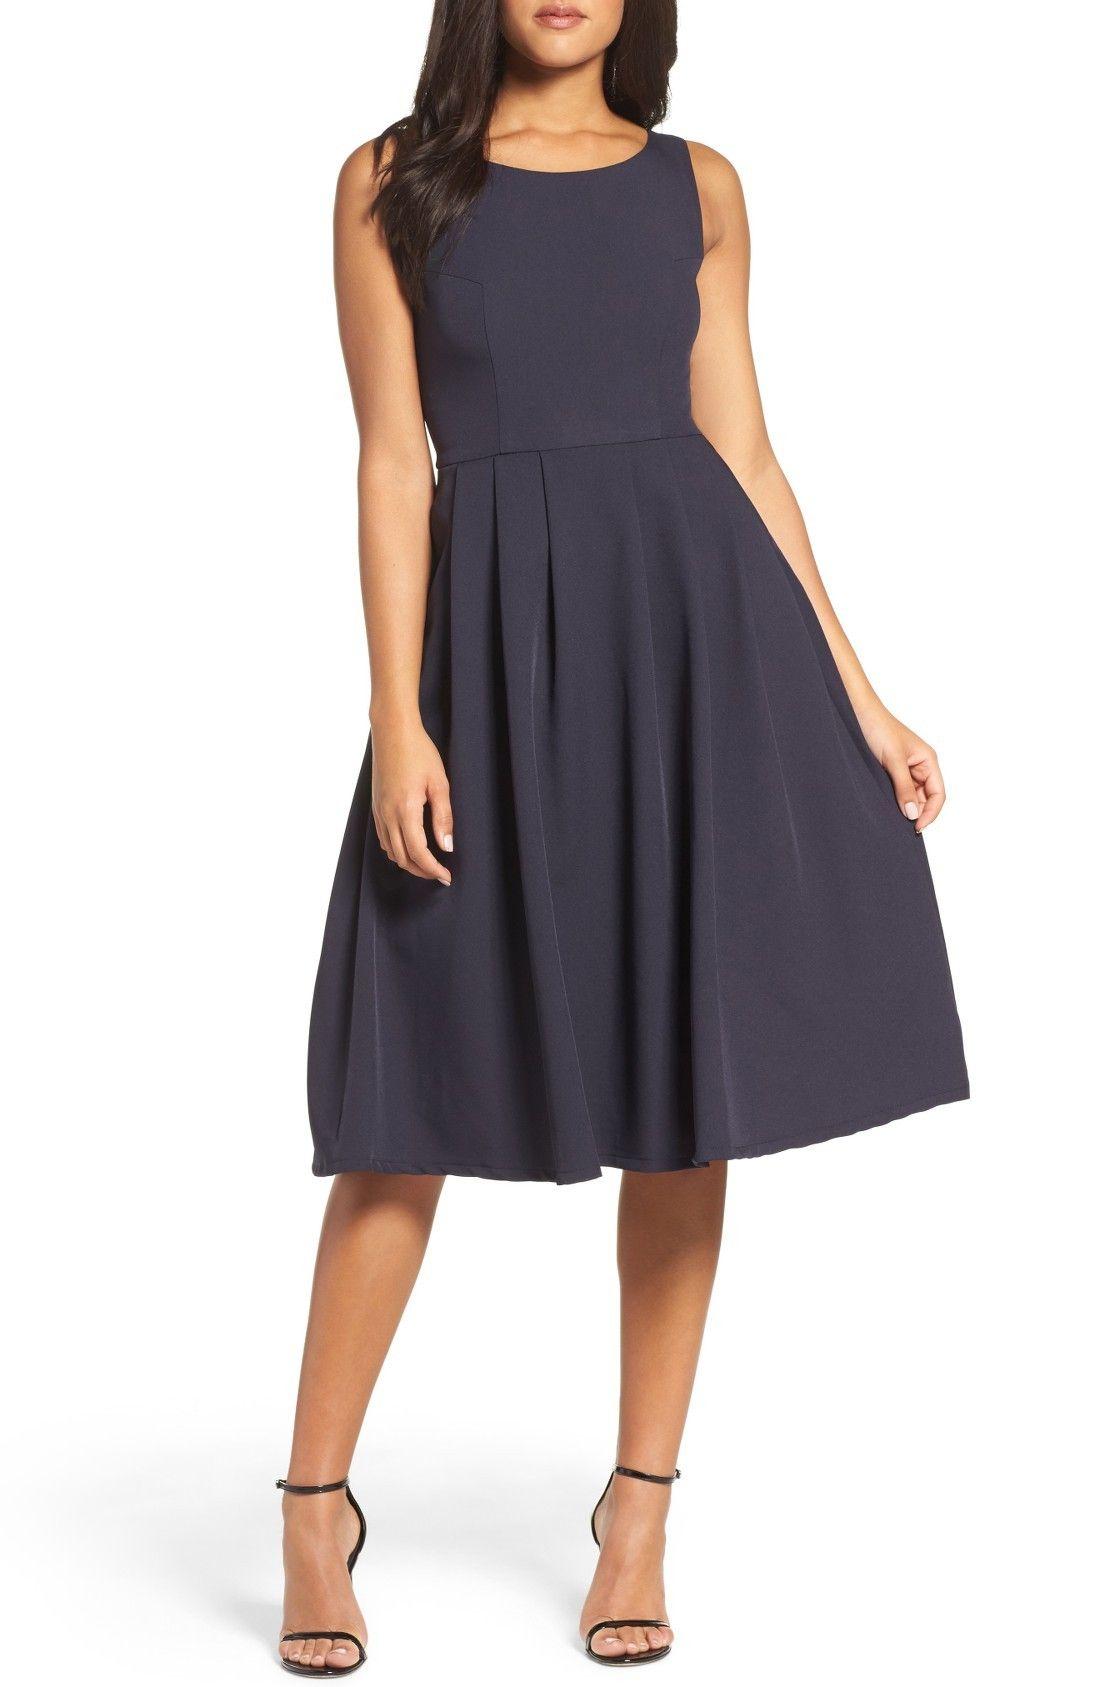 Dark blue dresses fit flare dress feminine dress flare